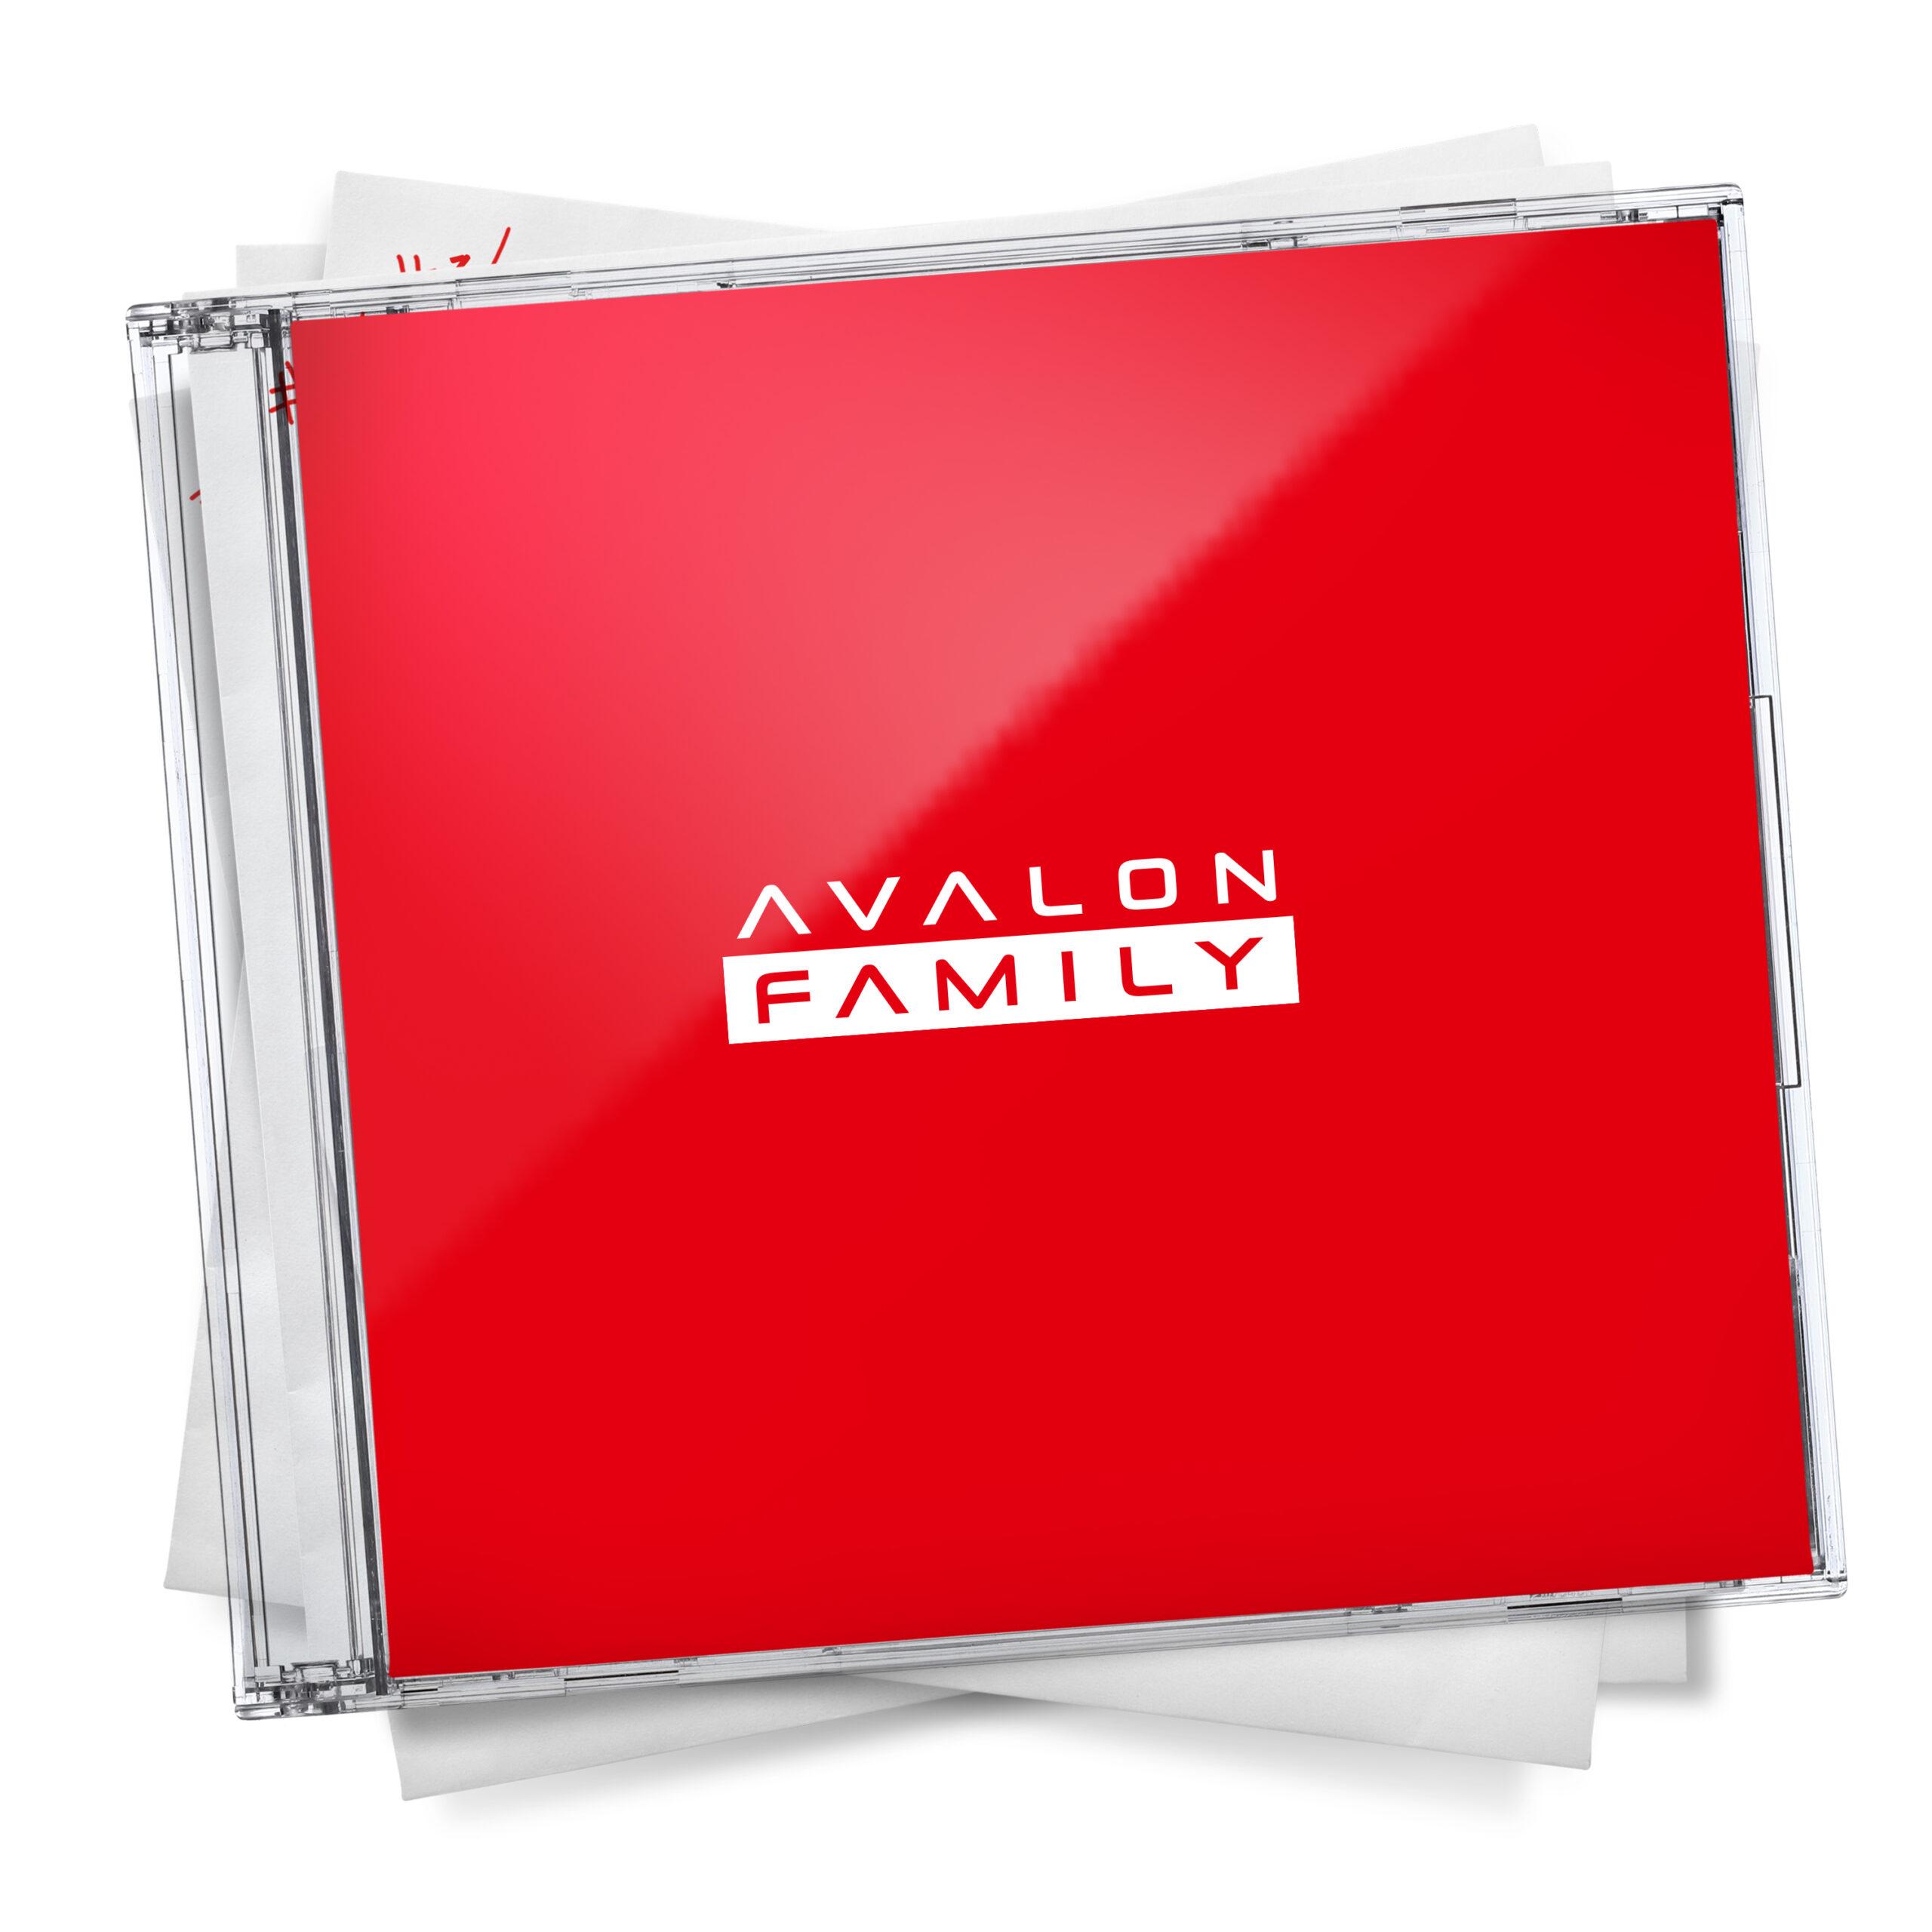 [OUT NOW] AVALON FAMILY ALBUM